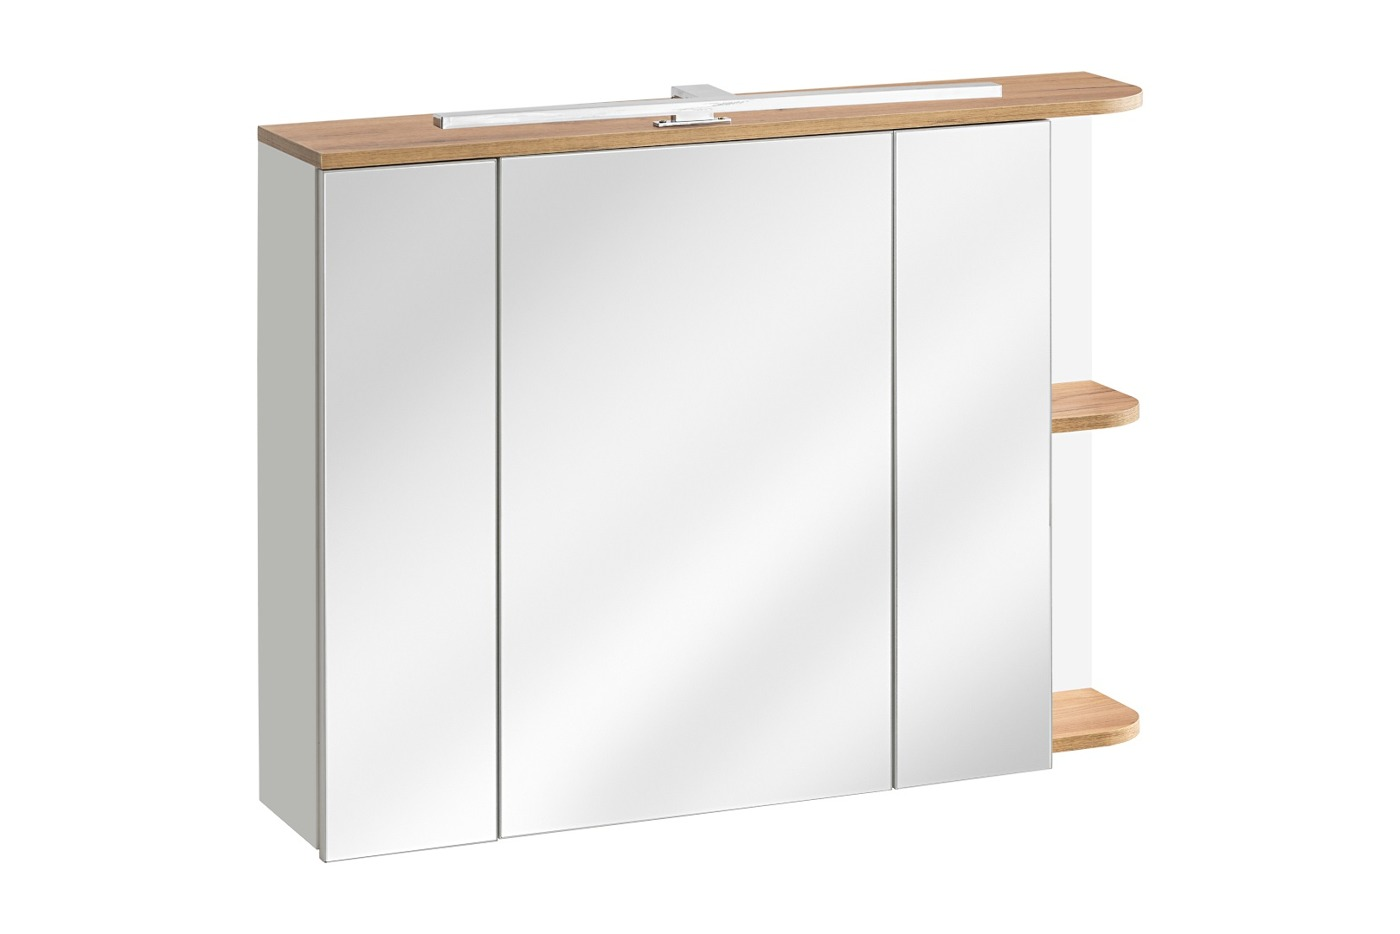 ArtCom Kúpeľňová zostava PLATINUM Platinum: zrkadlová skrinka 840   94 x 20 x 72 cm